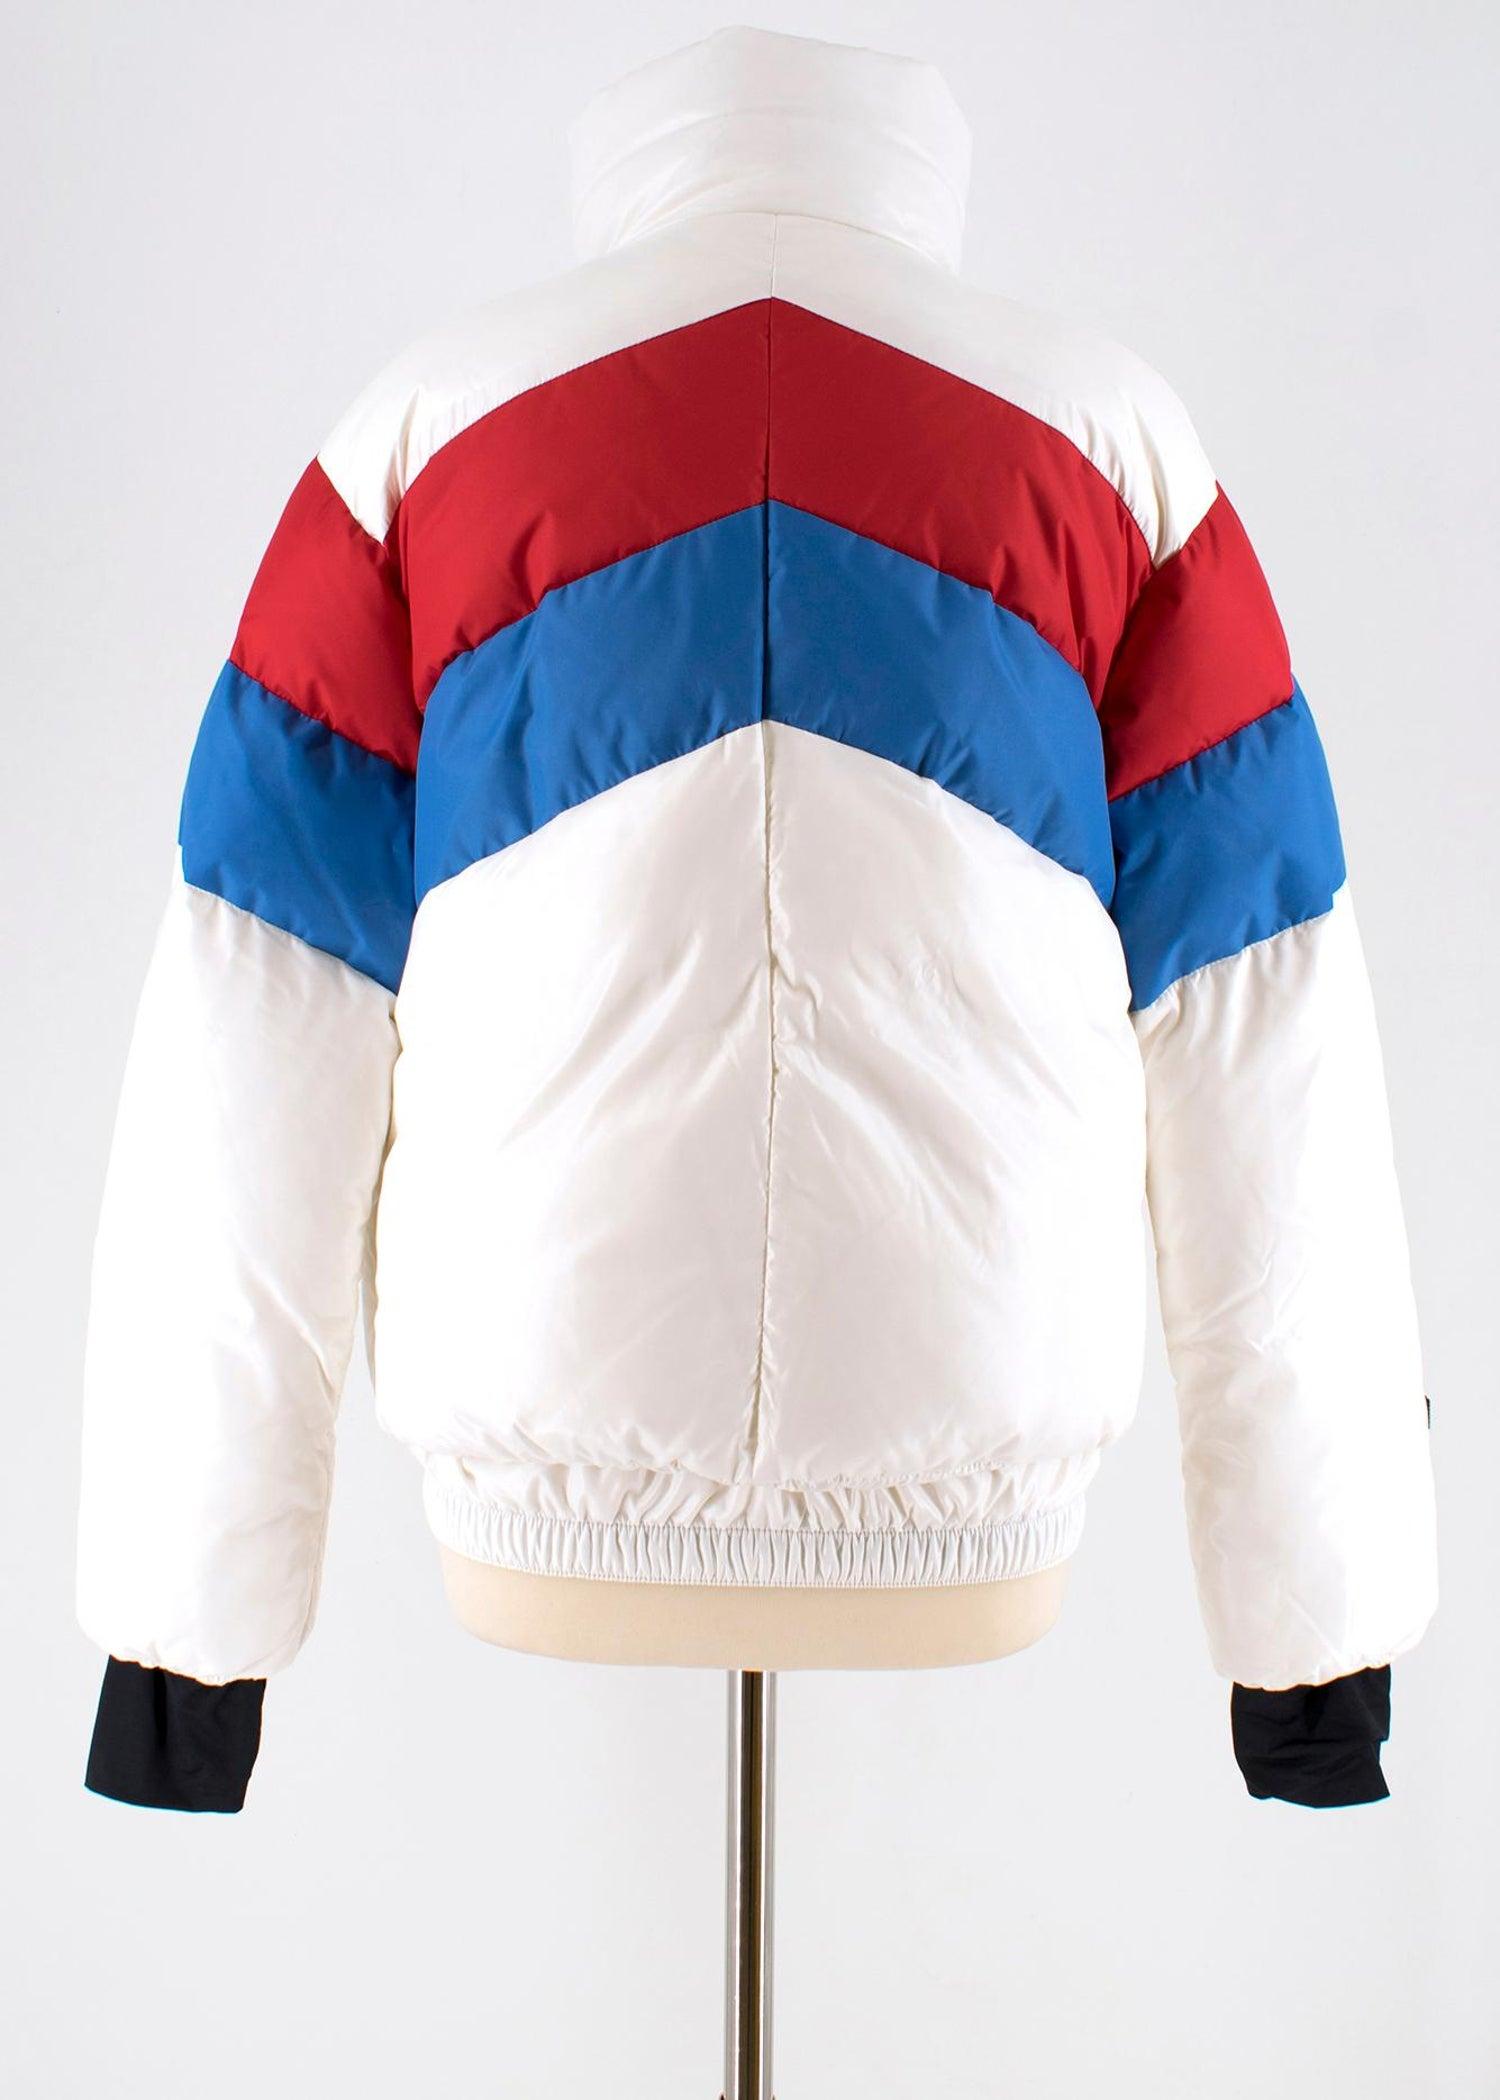 7686215ea Moncler Lamar Down-Filled Ski Jacket - New Season US 4 (SIZE 0)